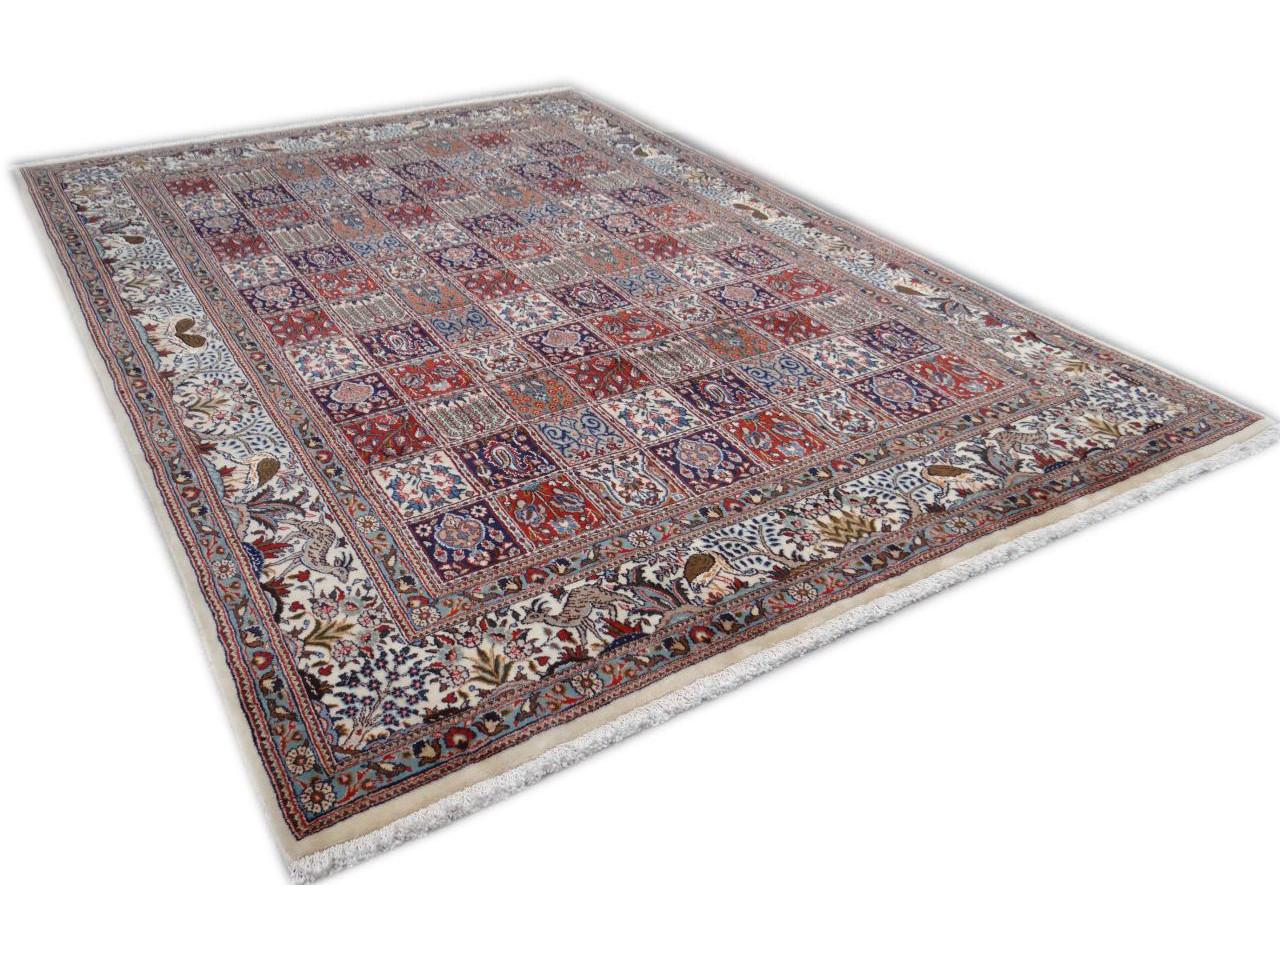 moud jardin tapis persans n 2430 294x202cm. Black Bedroom Furniture Sets. Home Design Ideas